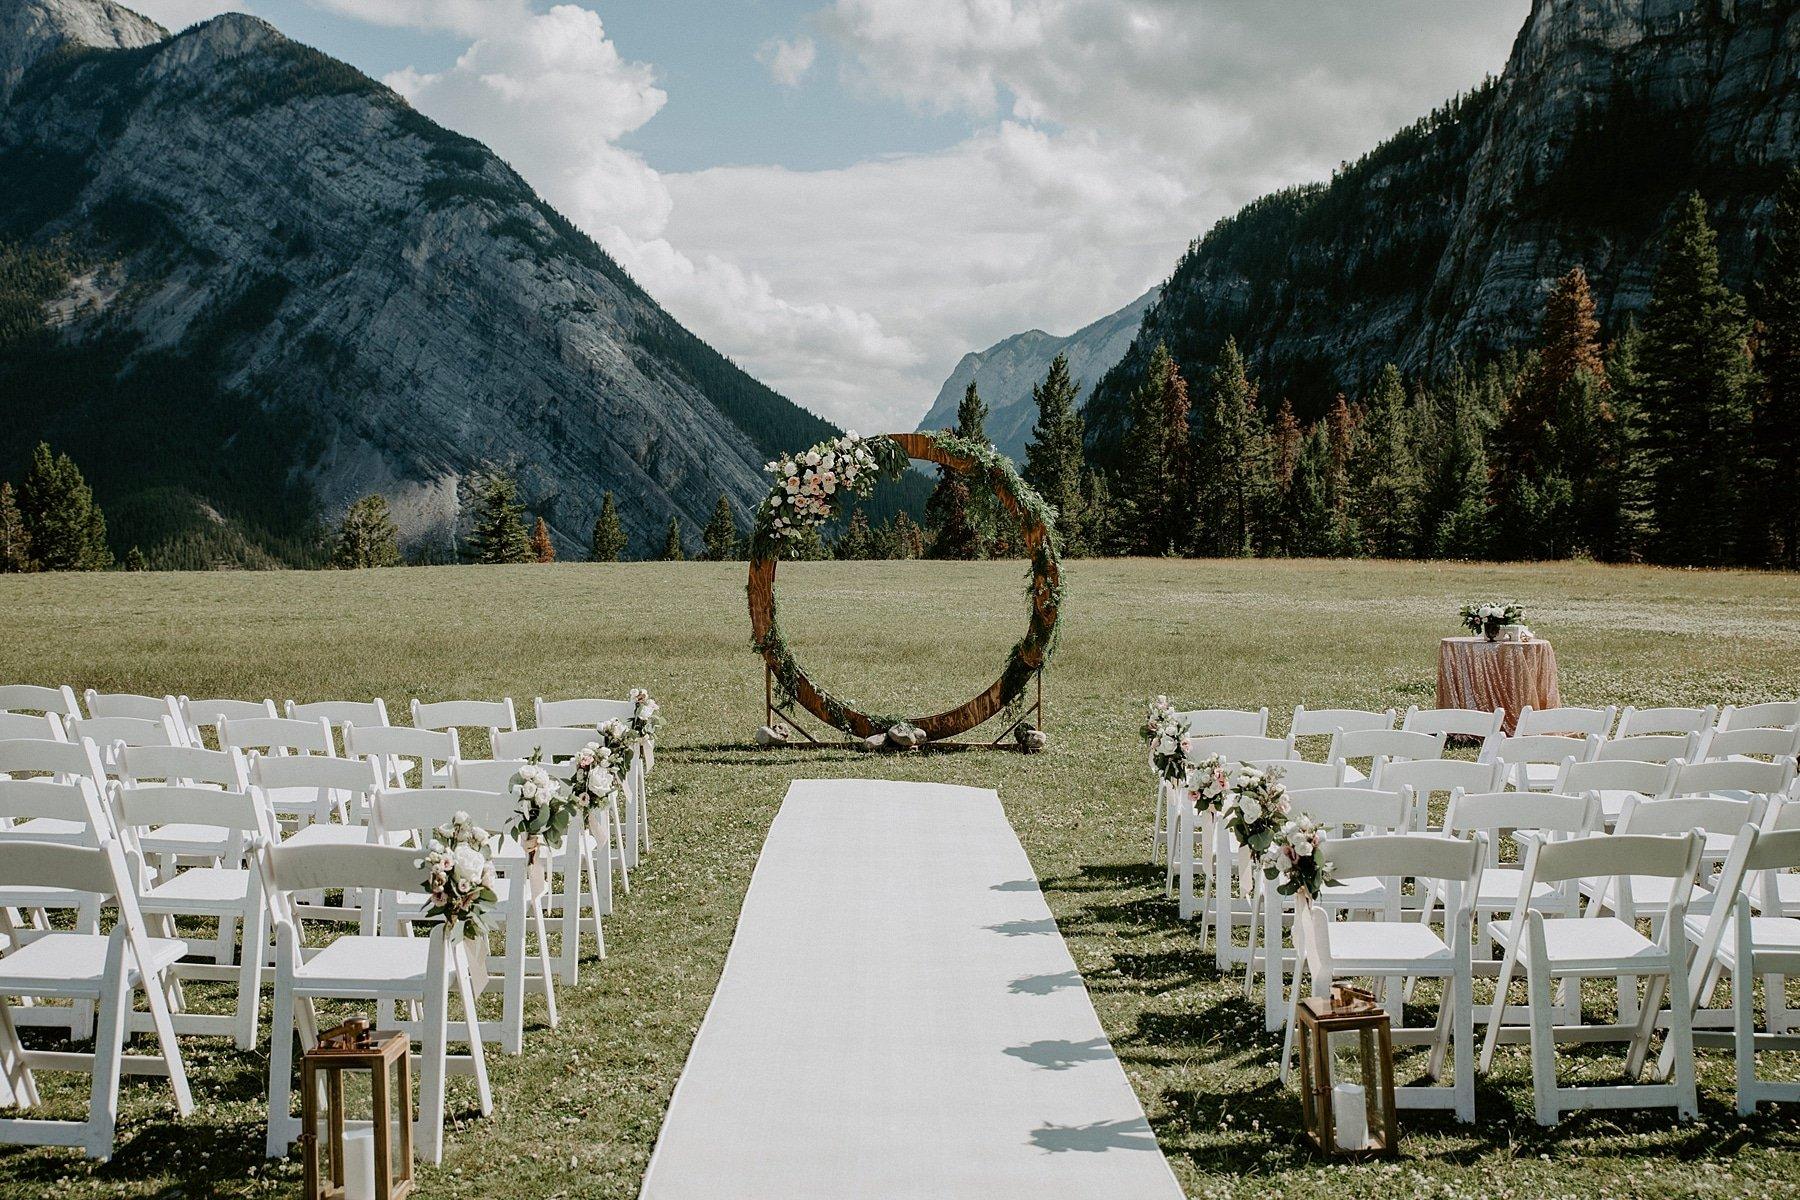 Tunnel Mountain Wedding ceremony